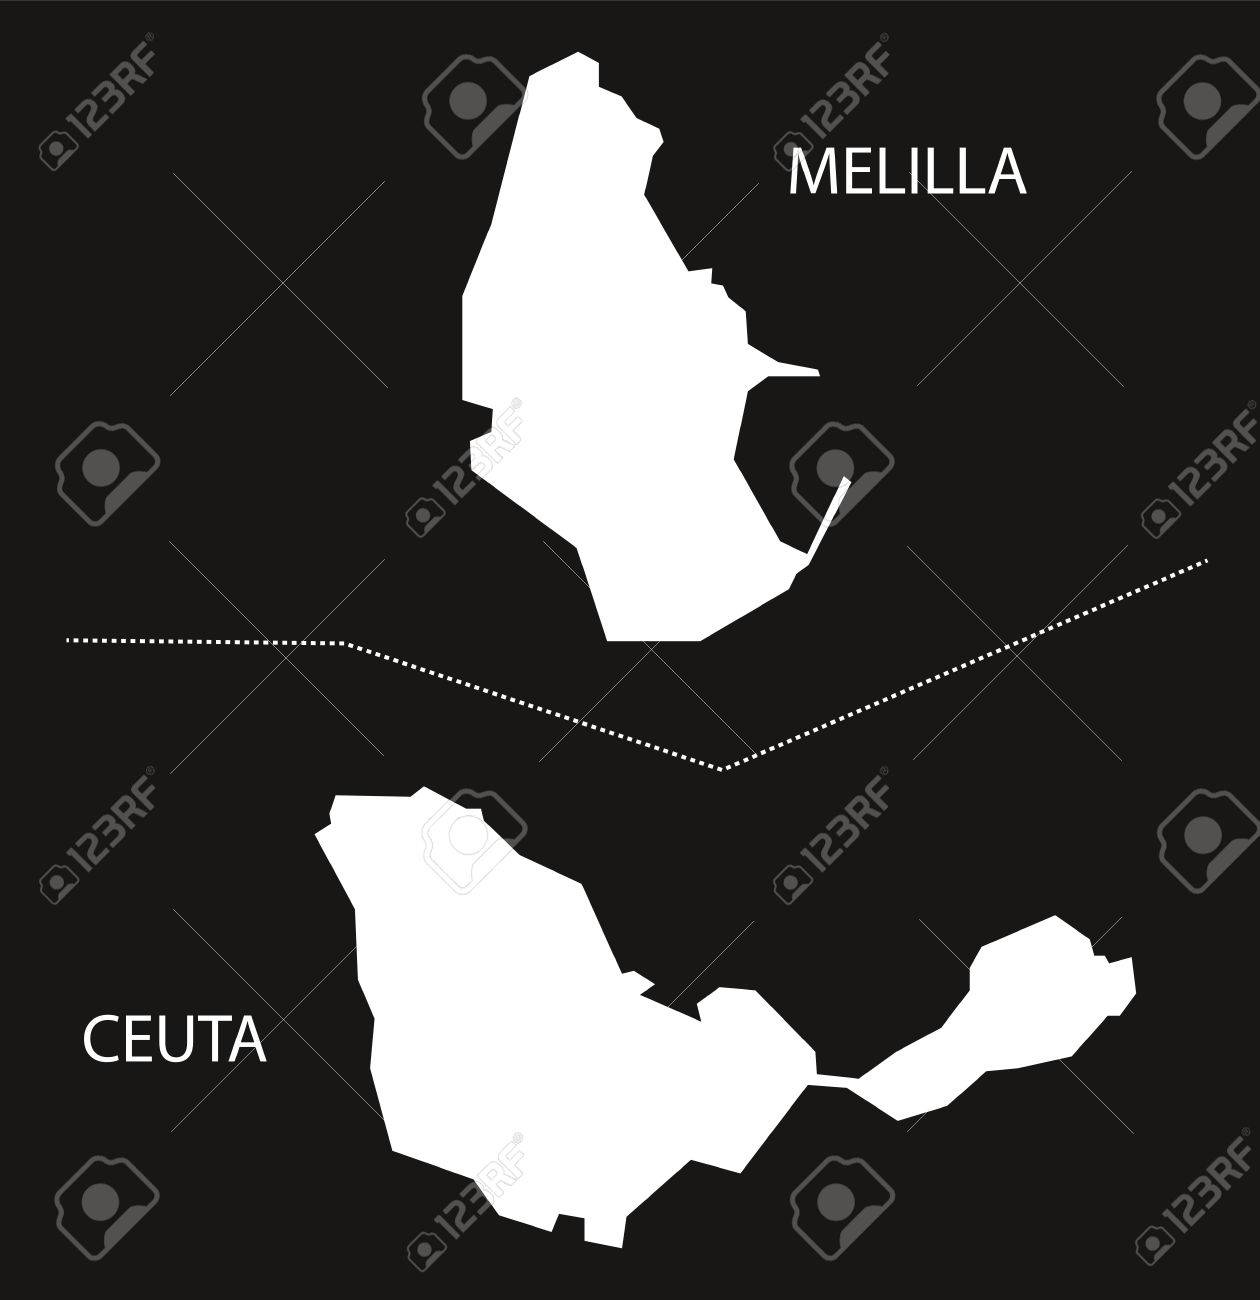 Melilla Spain Map.Melilla And Ceuta Spain Map Black Inverted Silhouette Illustration